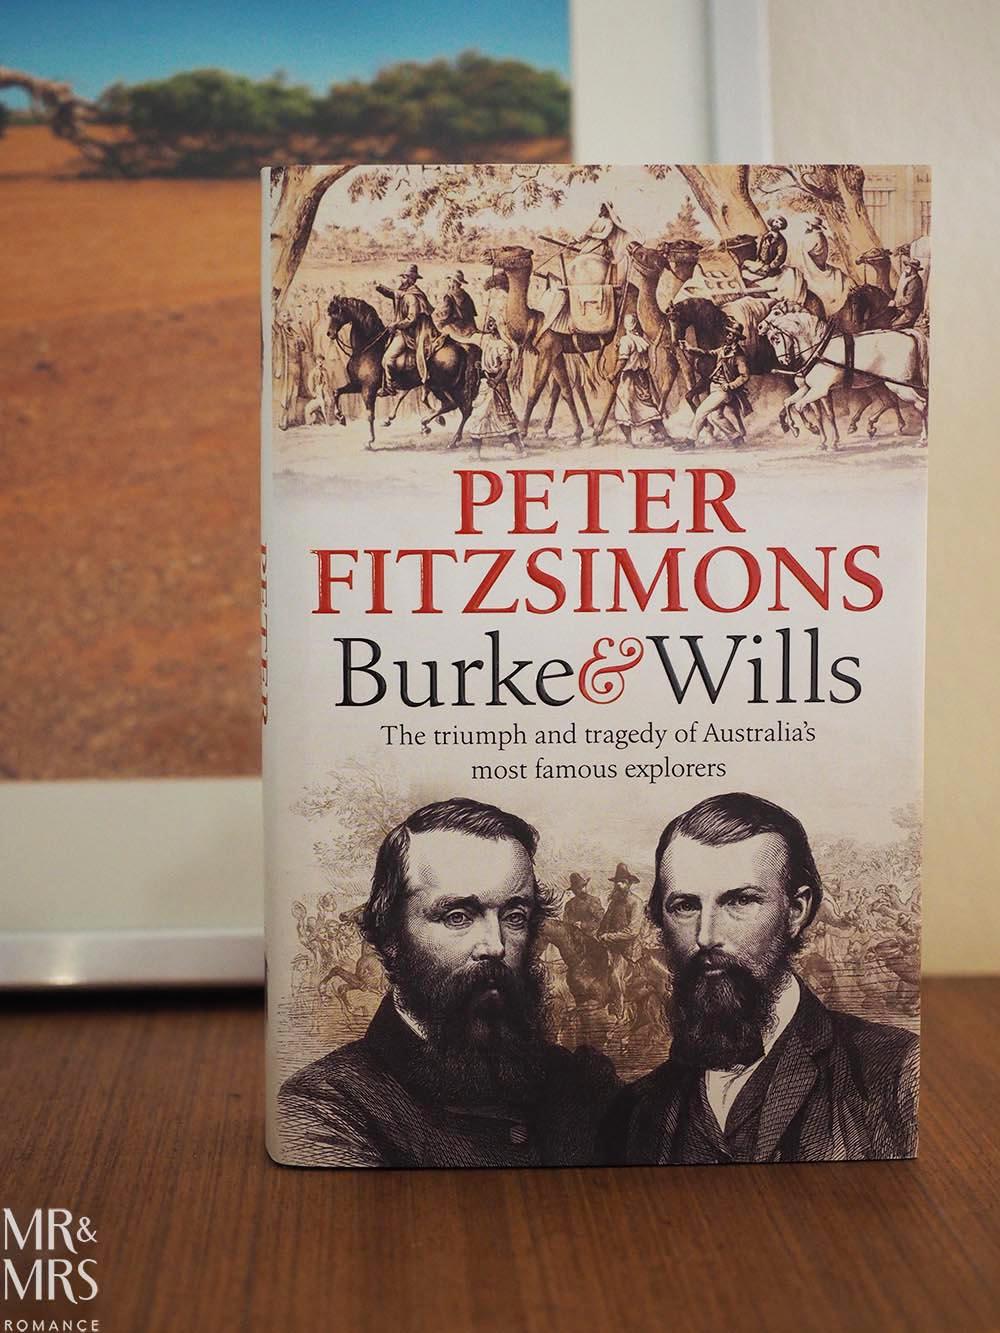 Holiday book guide for guys - books for men - Burke & Wills